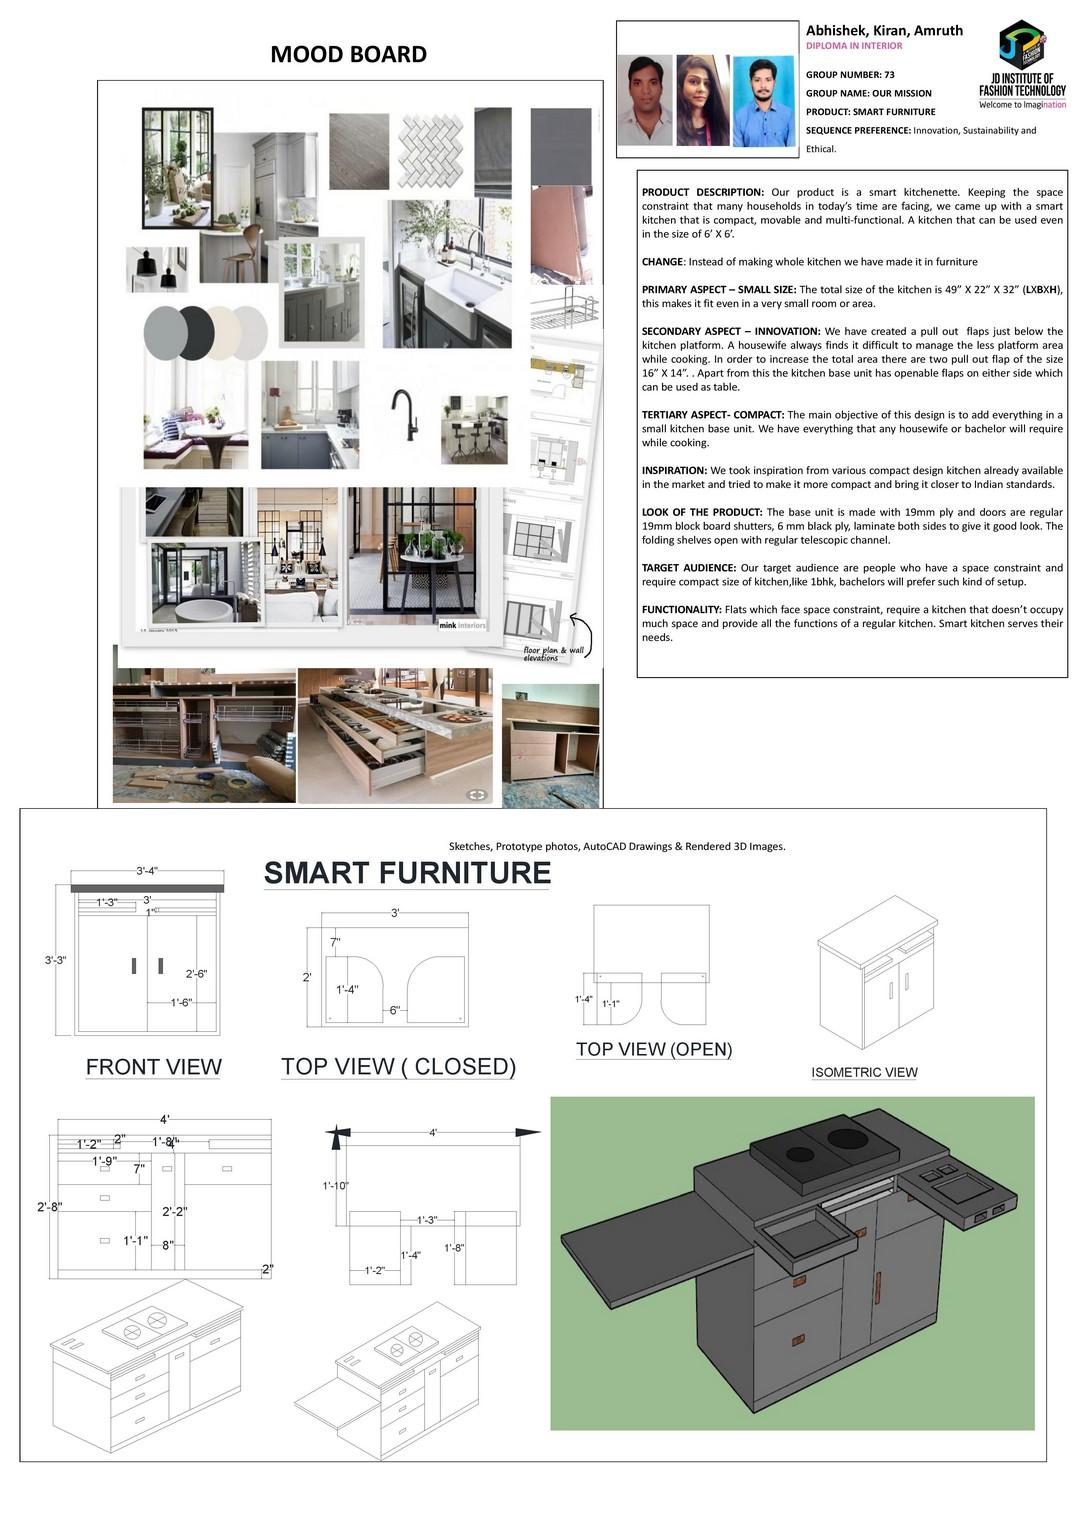 Smart Furniture – Change – JD Annual Design Awards 2018 | Designer: Abhishek Anurag, Amruth Nayaks and Kiran Patel | Photography : Jerin Nath (@jerin_nath) smart furniture - smart furniture1 - Smart Furniture – Change – JD Annual Design Awards 2018